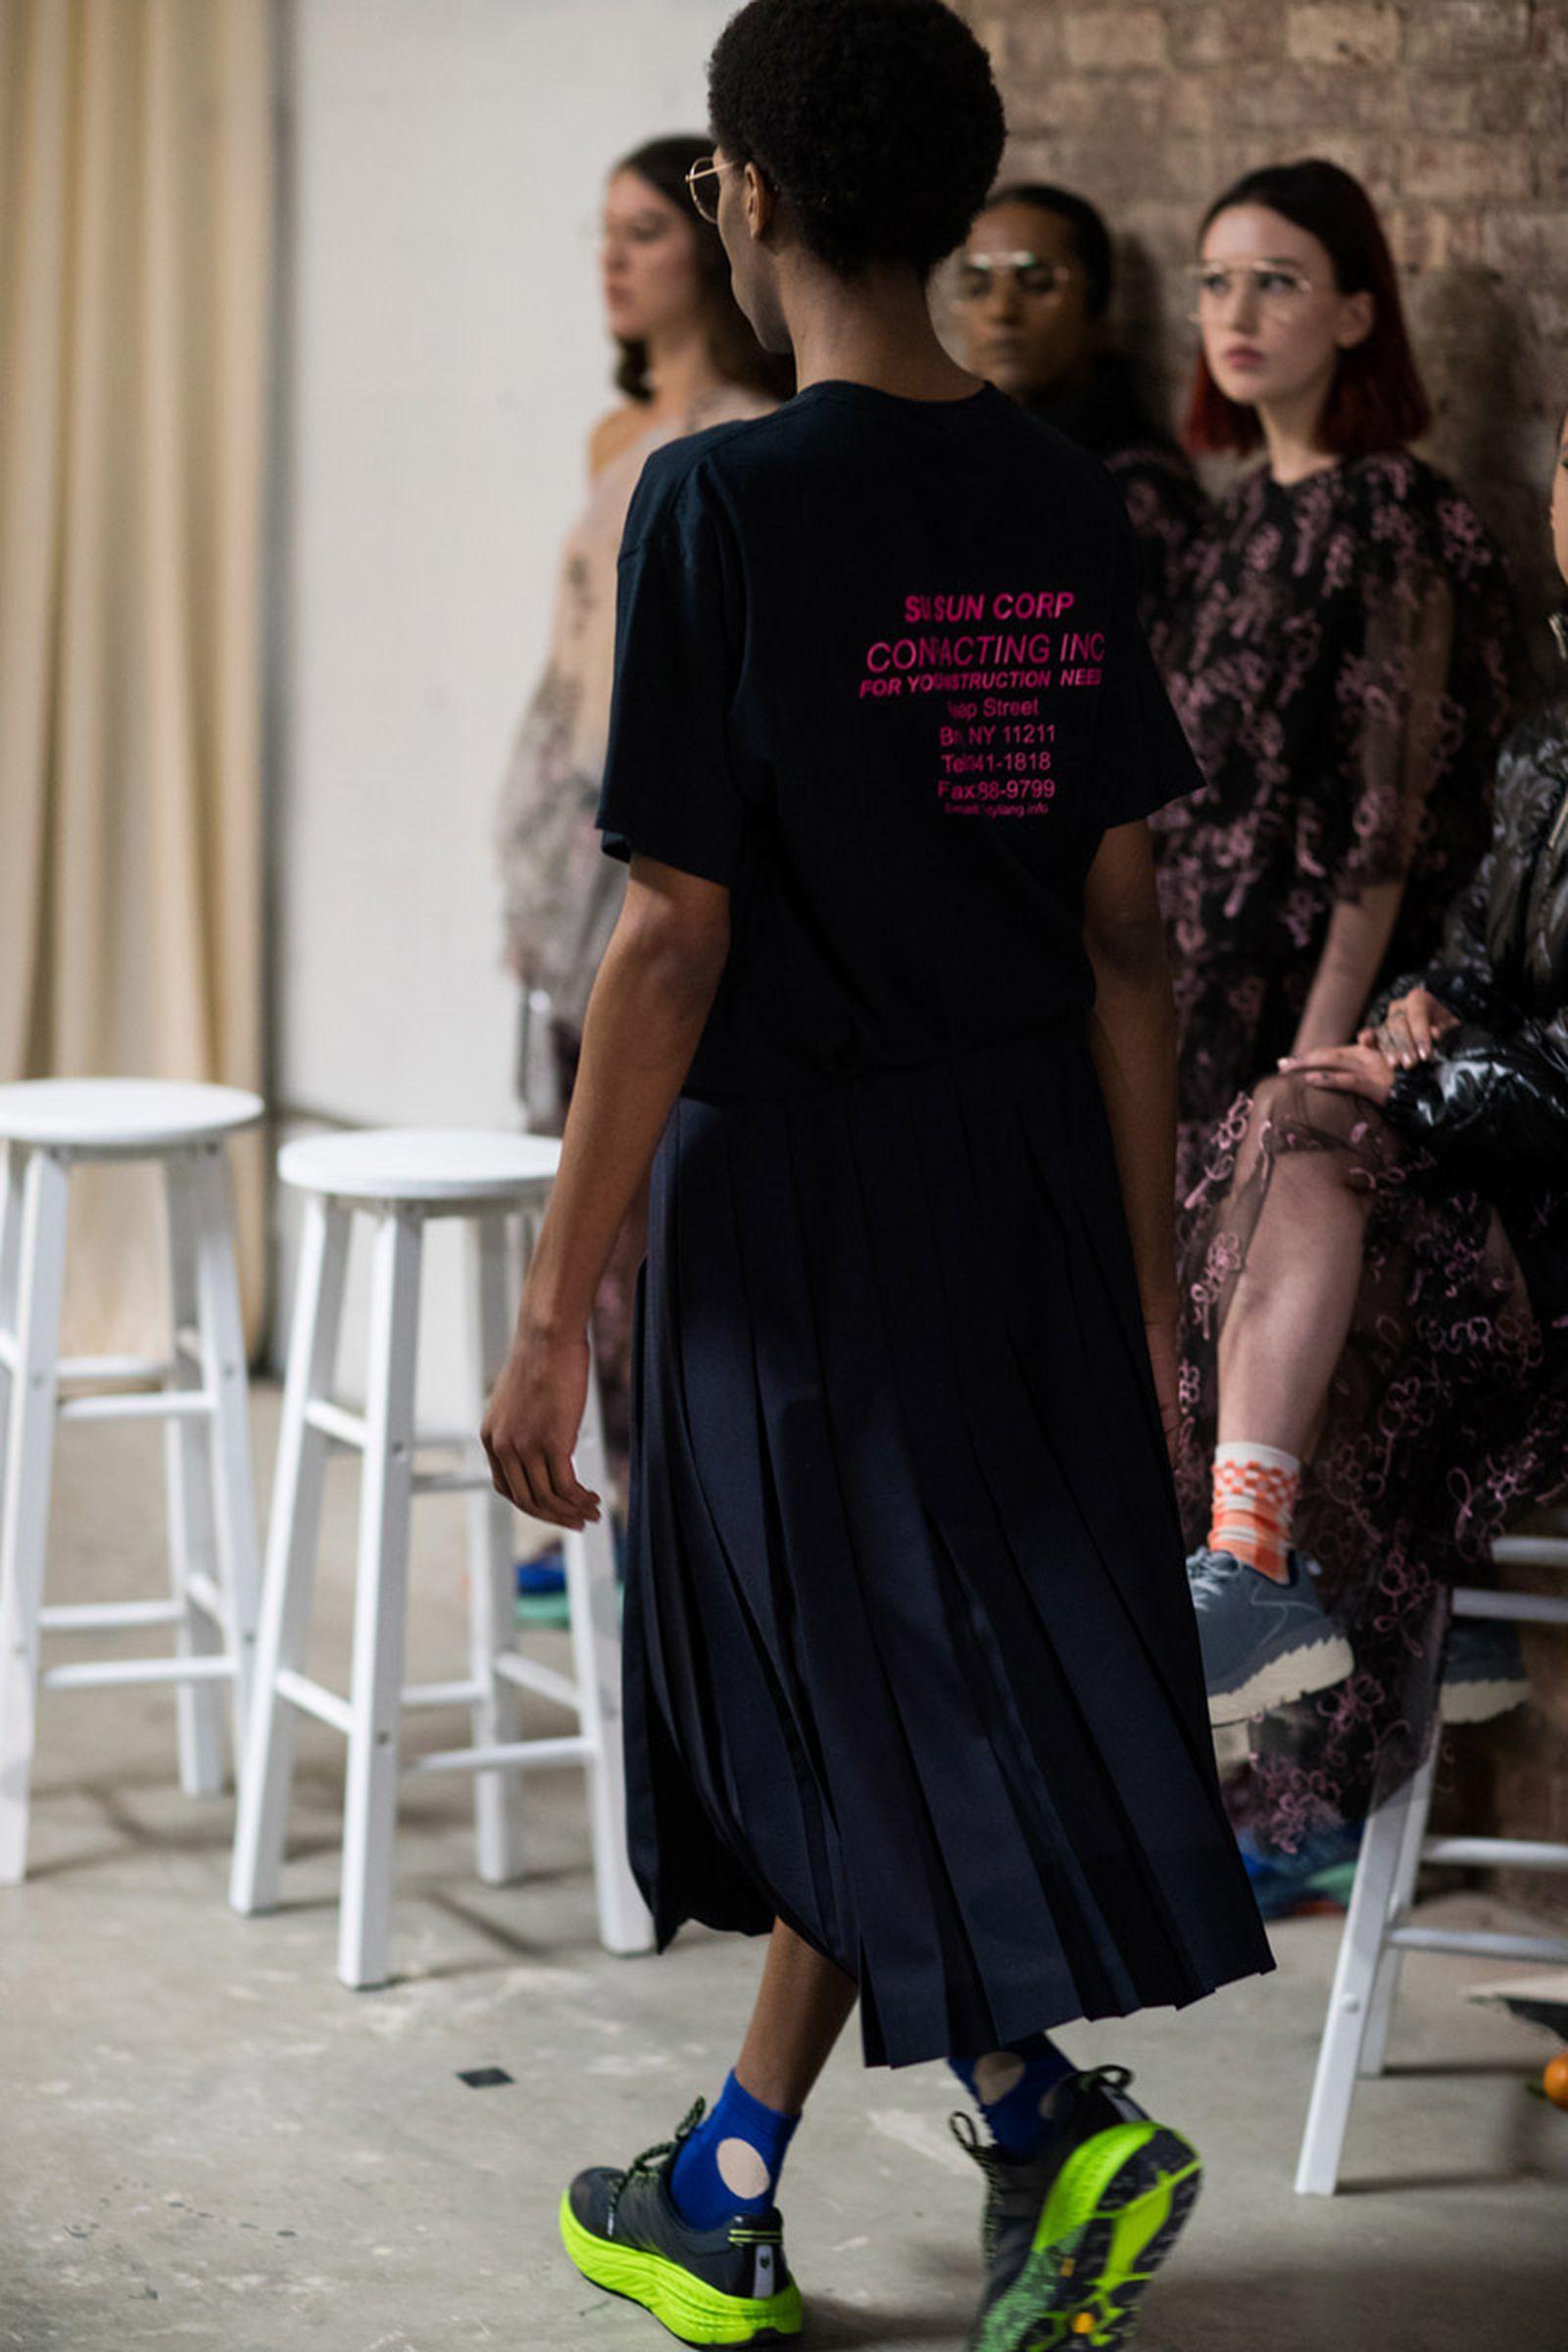 6sandy liang fw19 new york fasgion week Sadny Liang new york fashion week